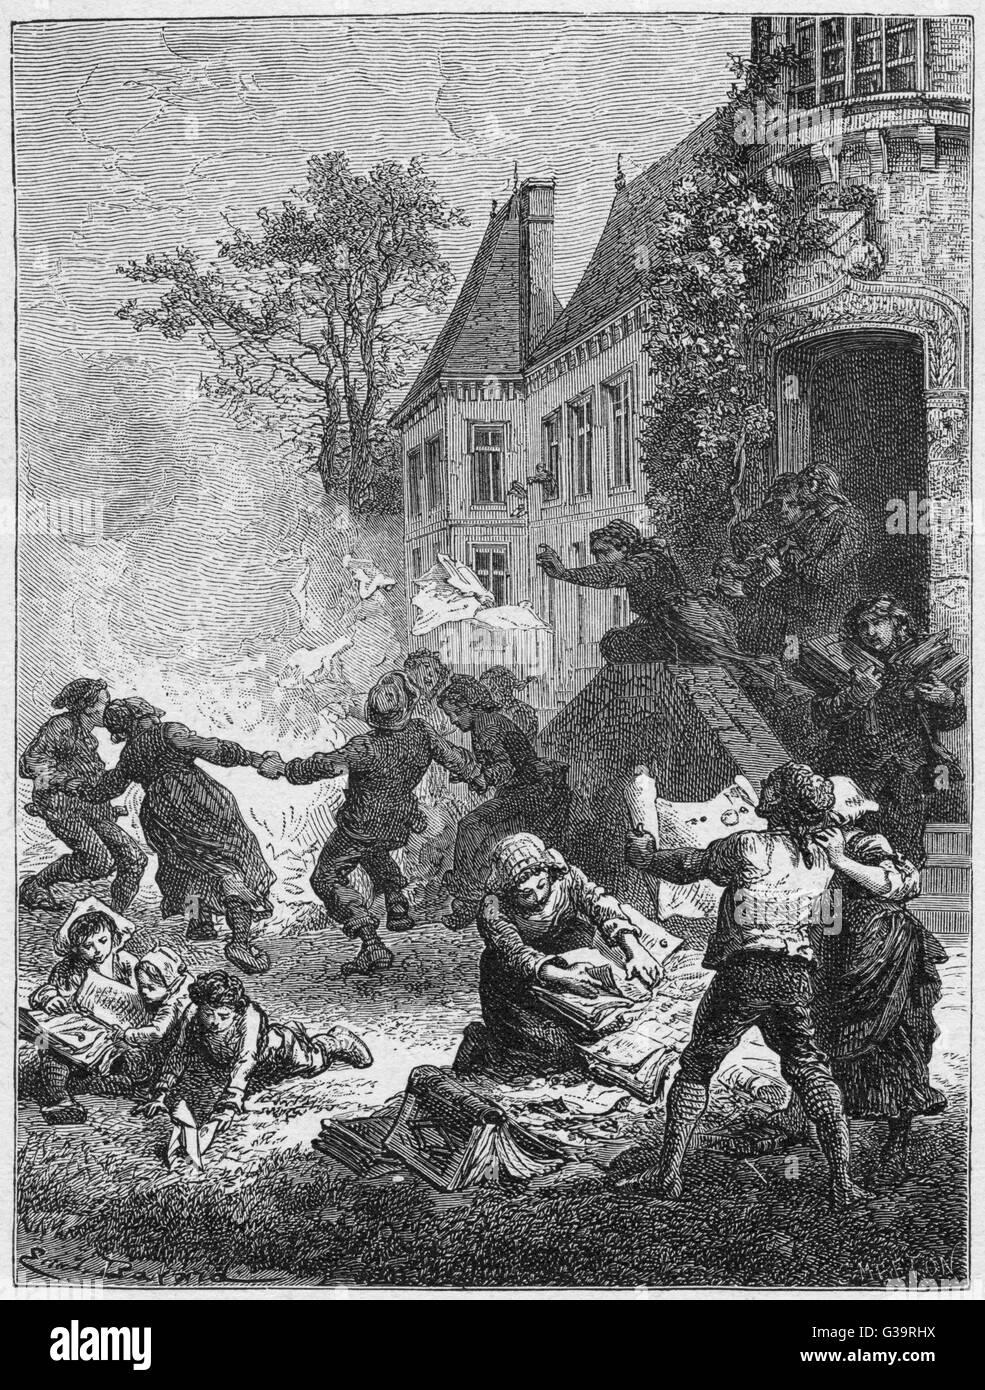 Peasants destroy feudal title  deeds.         Date: August 1789 - Stock Image